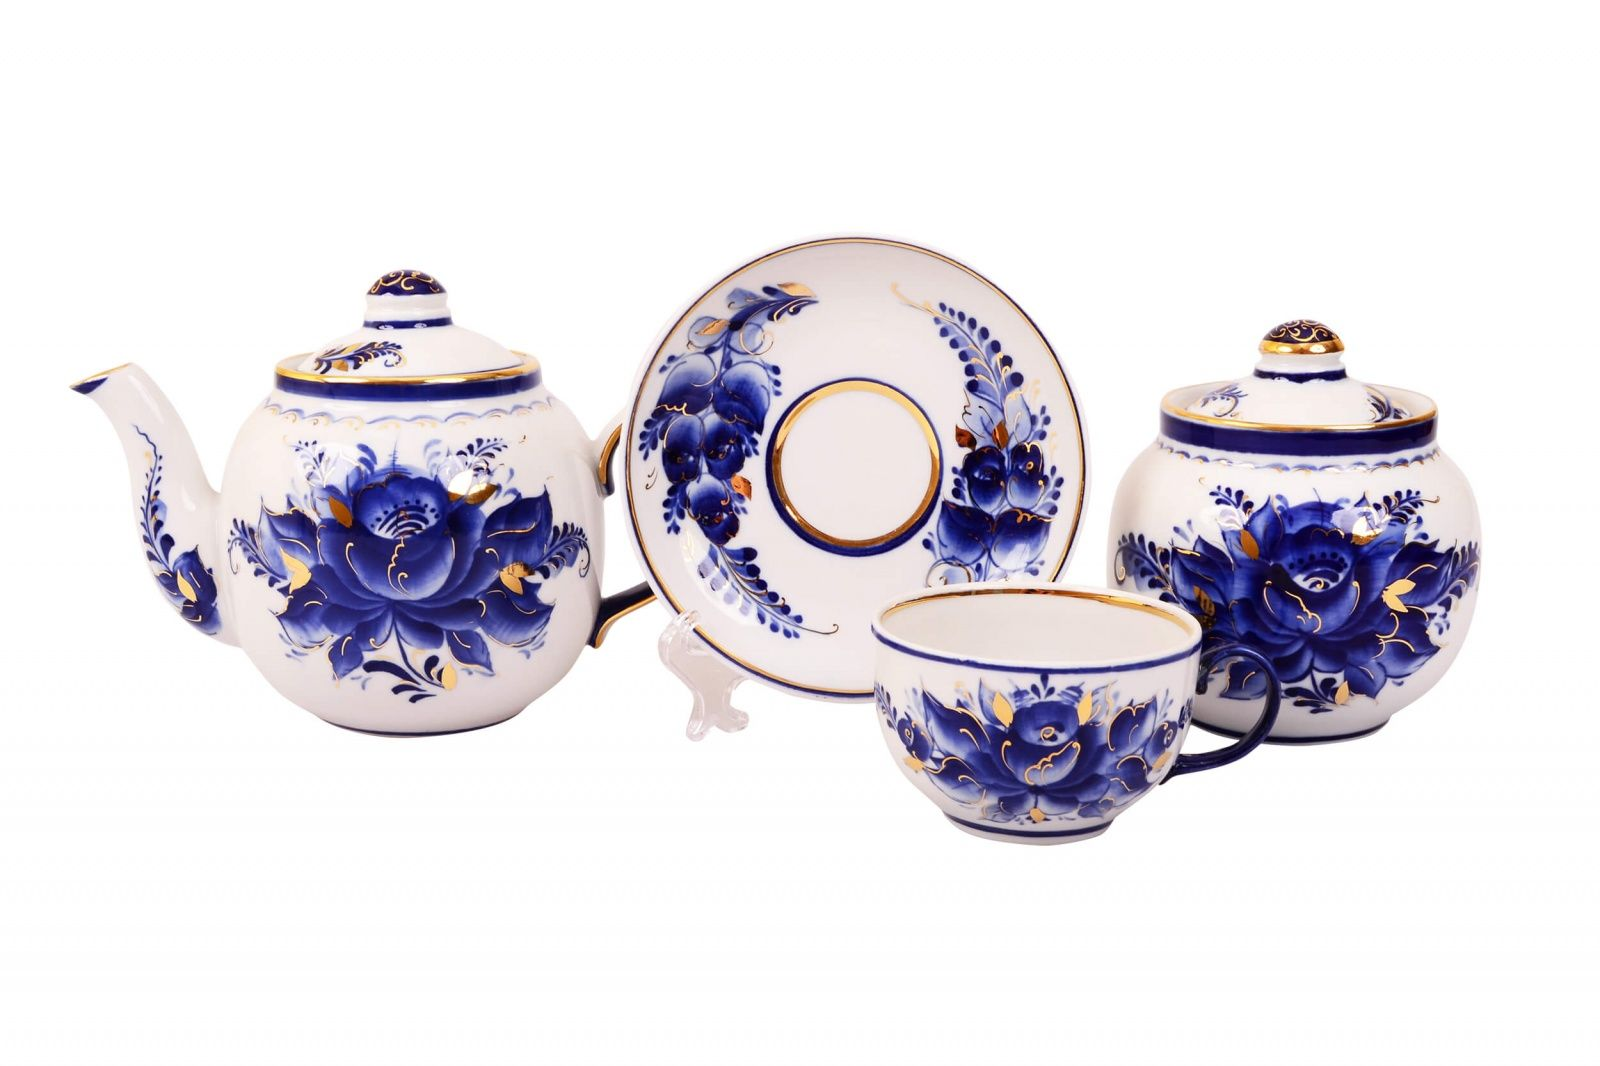 Dulevo porcelain / Tea set 14 pcs. Amber Rose Gold